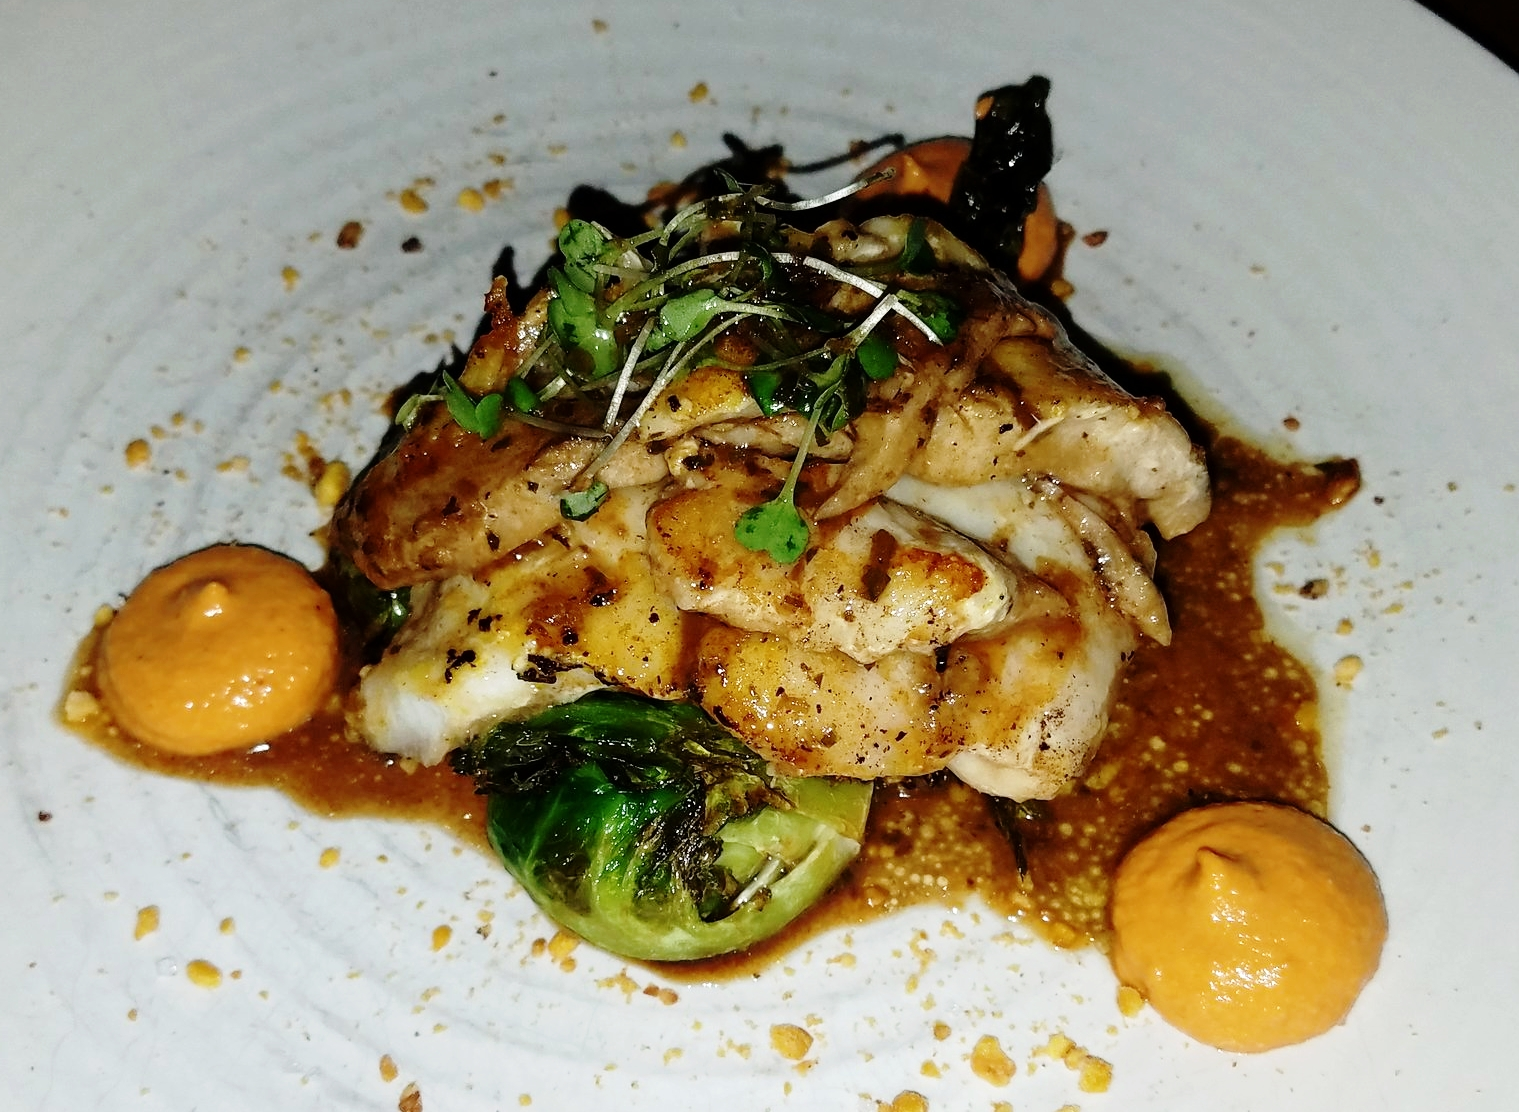 fish in restaurant